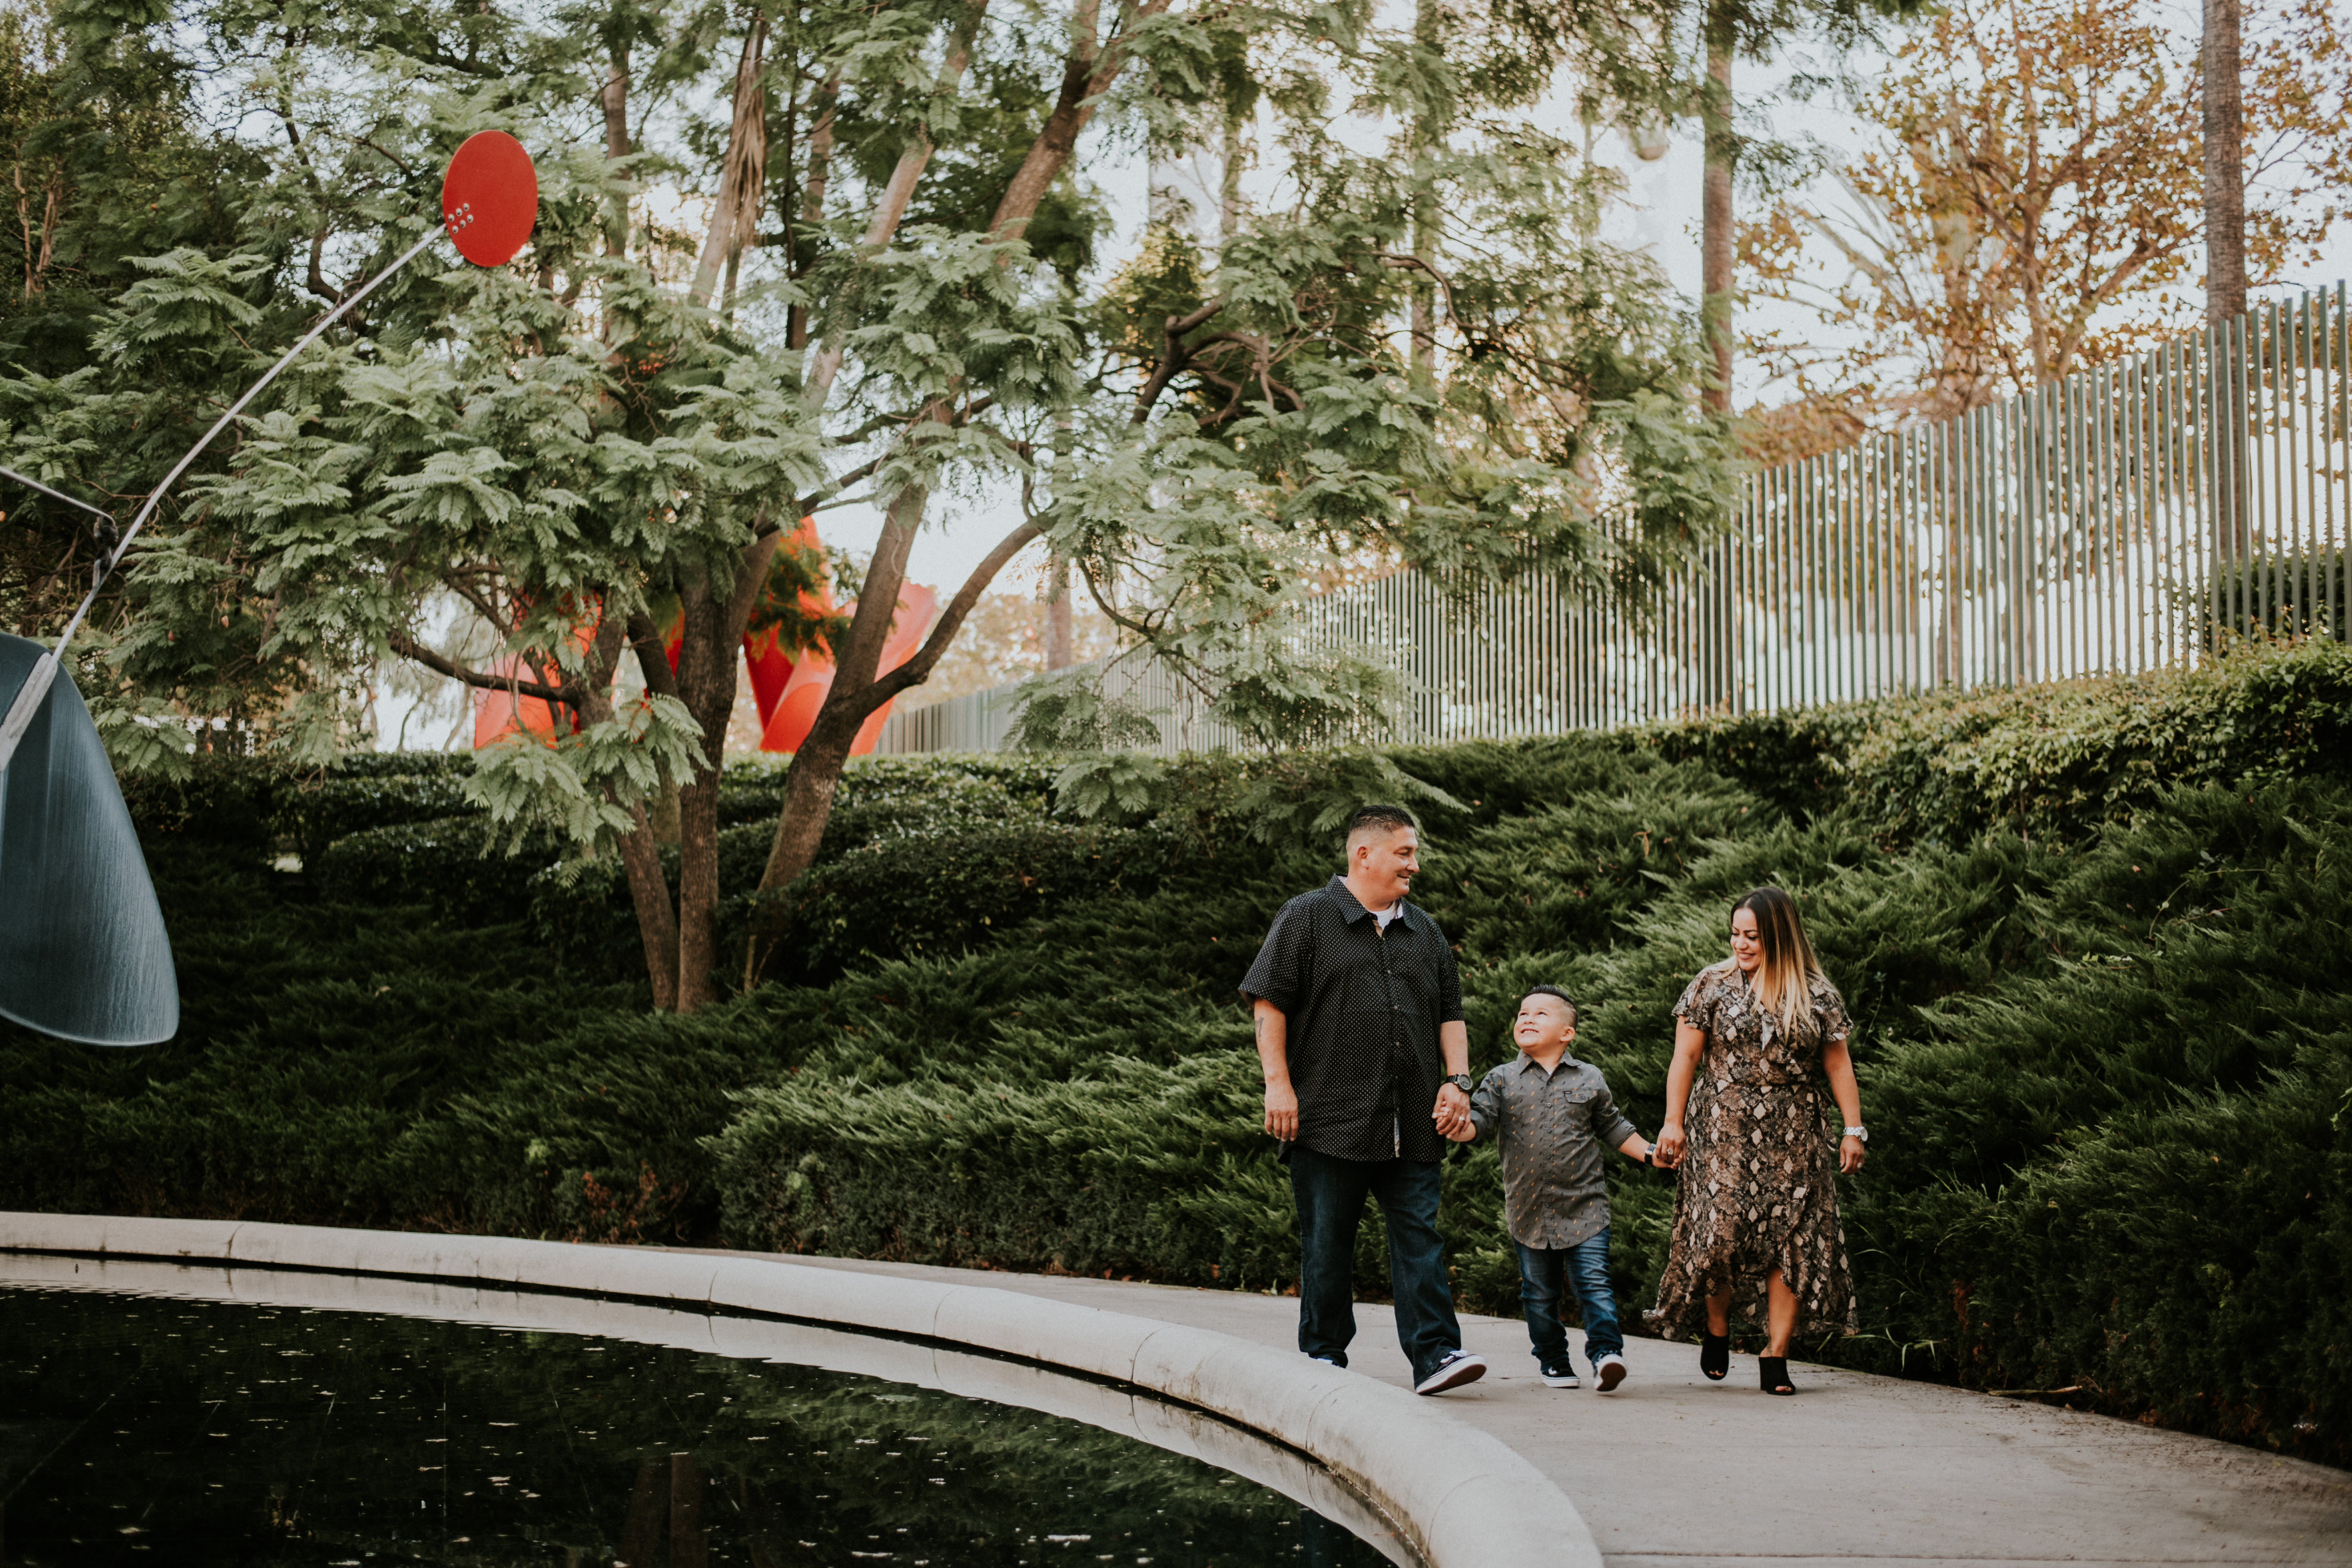 family walking in city park family photography los angeles california